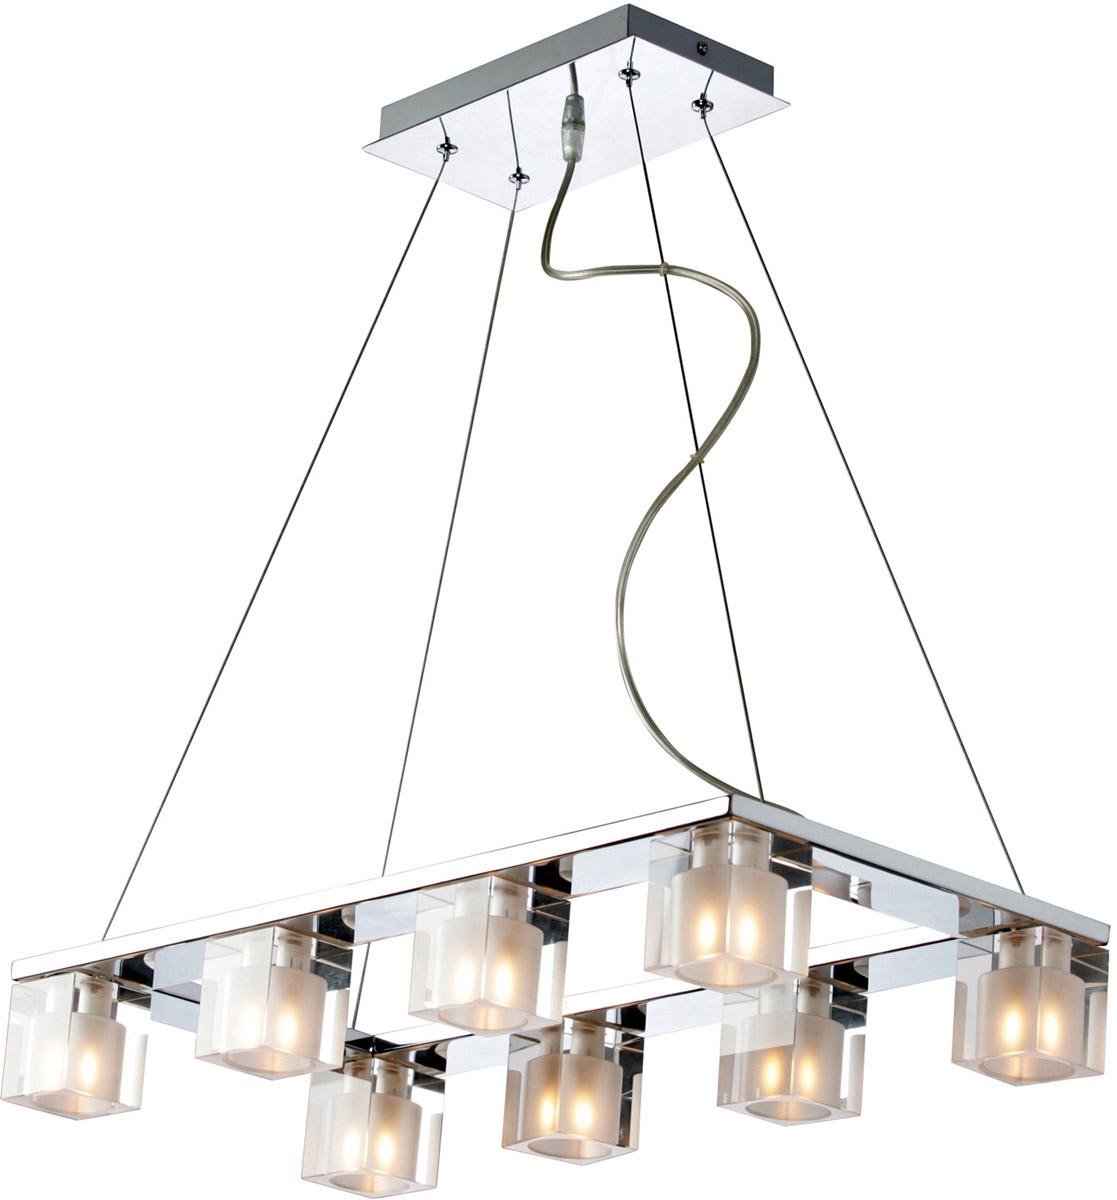 ET2 Blocs 8-Light Island Lights, Polished Chrome